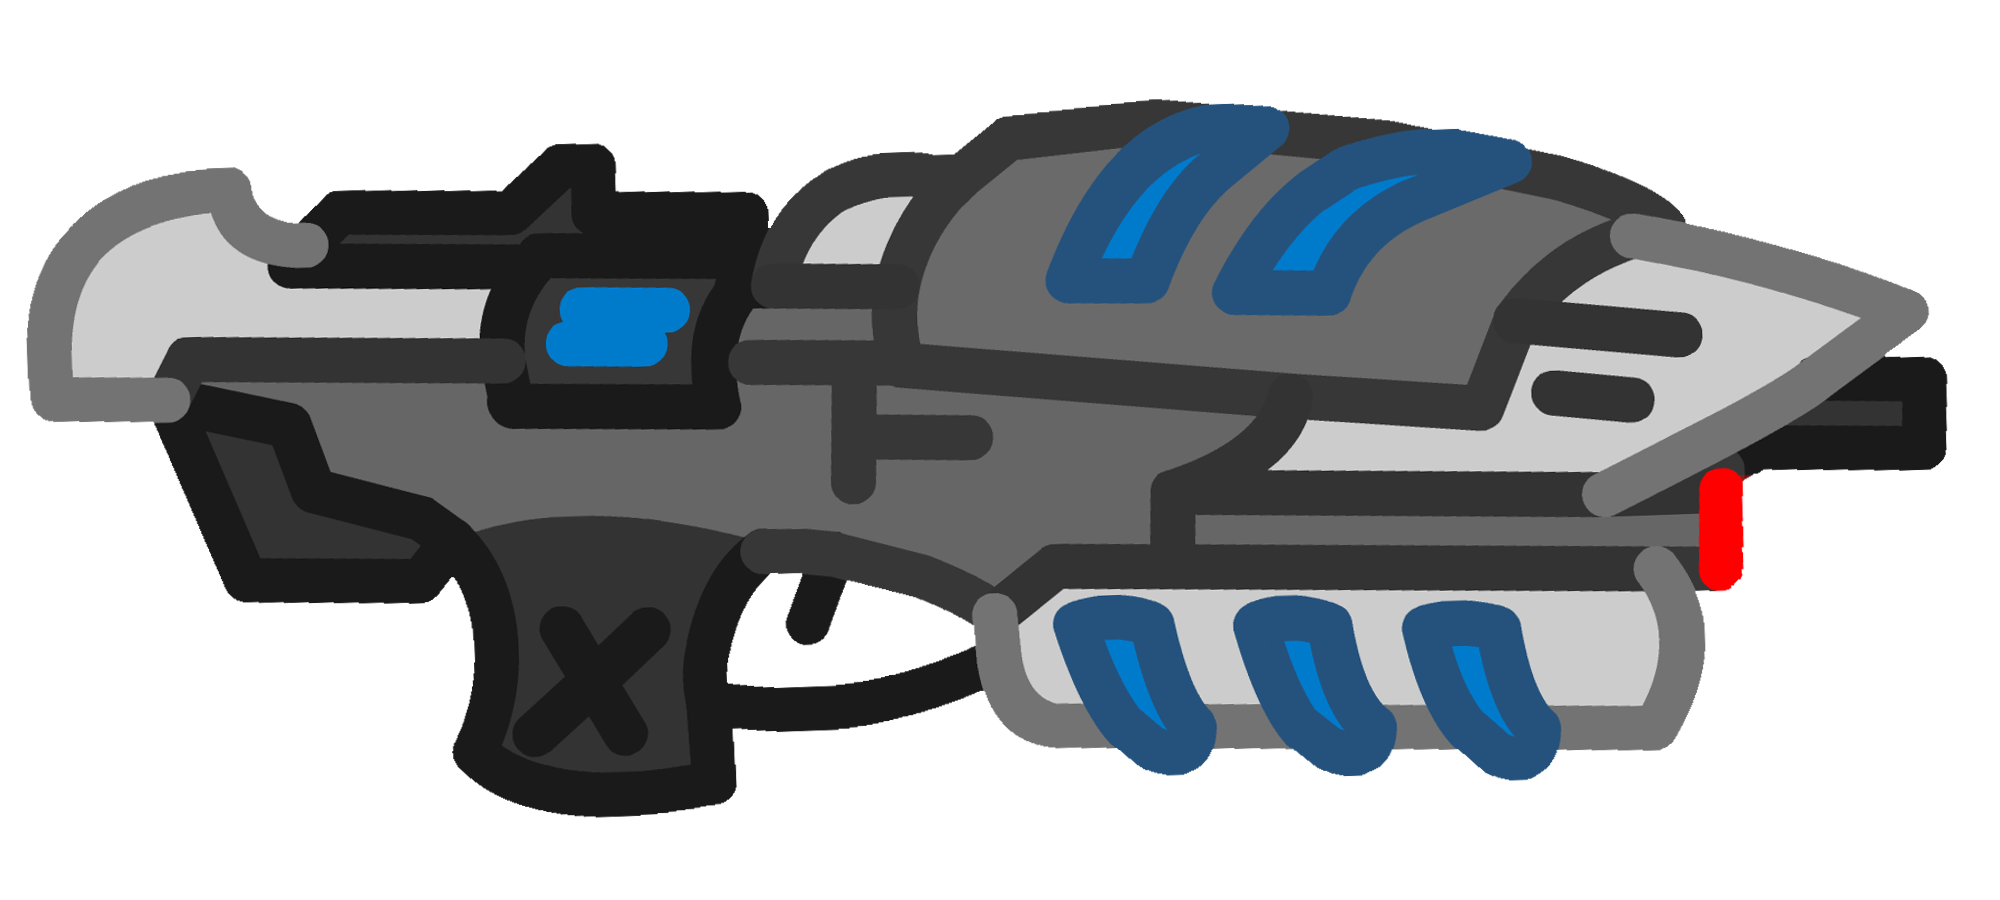 Clipart gun assault rifle. Image c r png